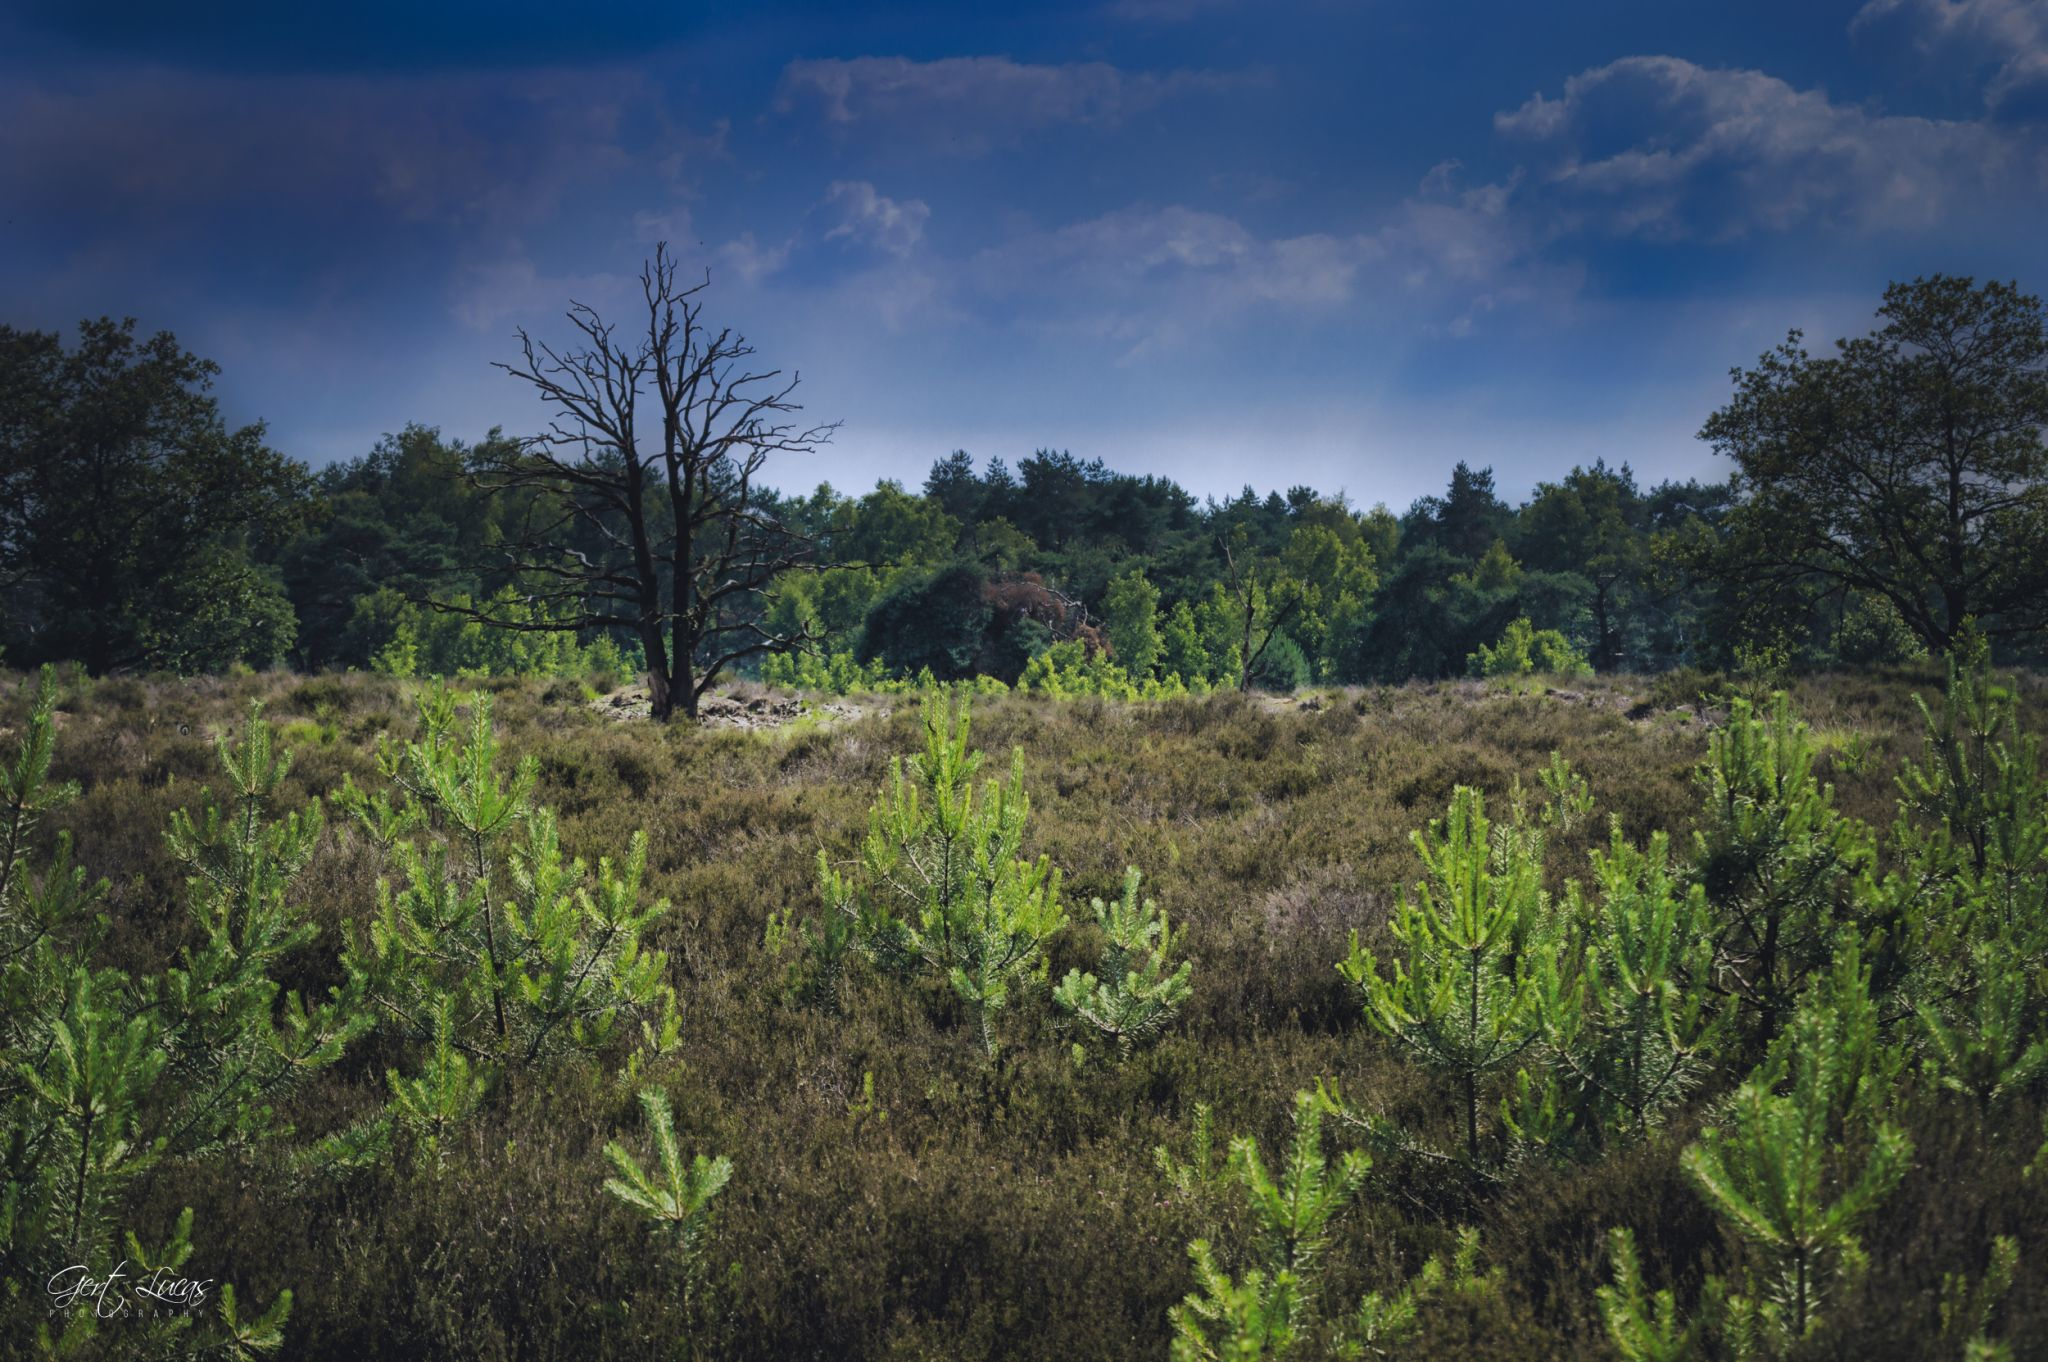 Kalmthoutse Heide, Belgium